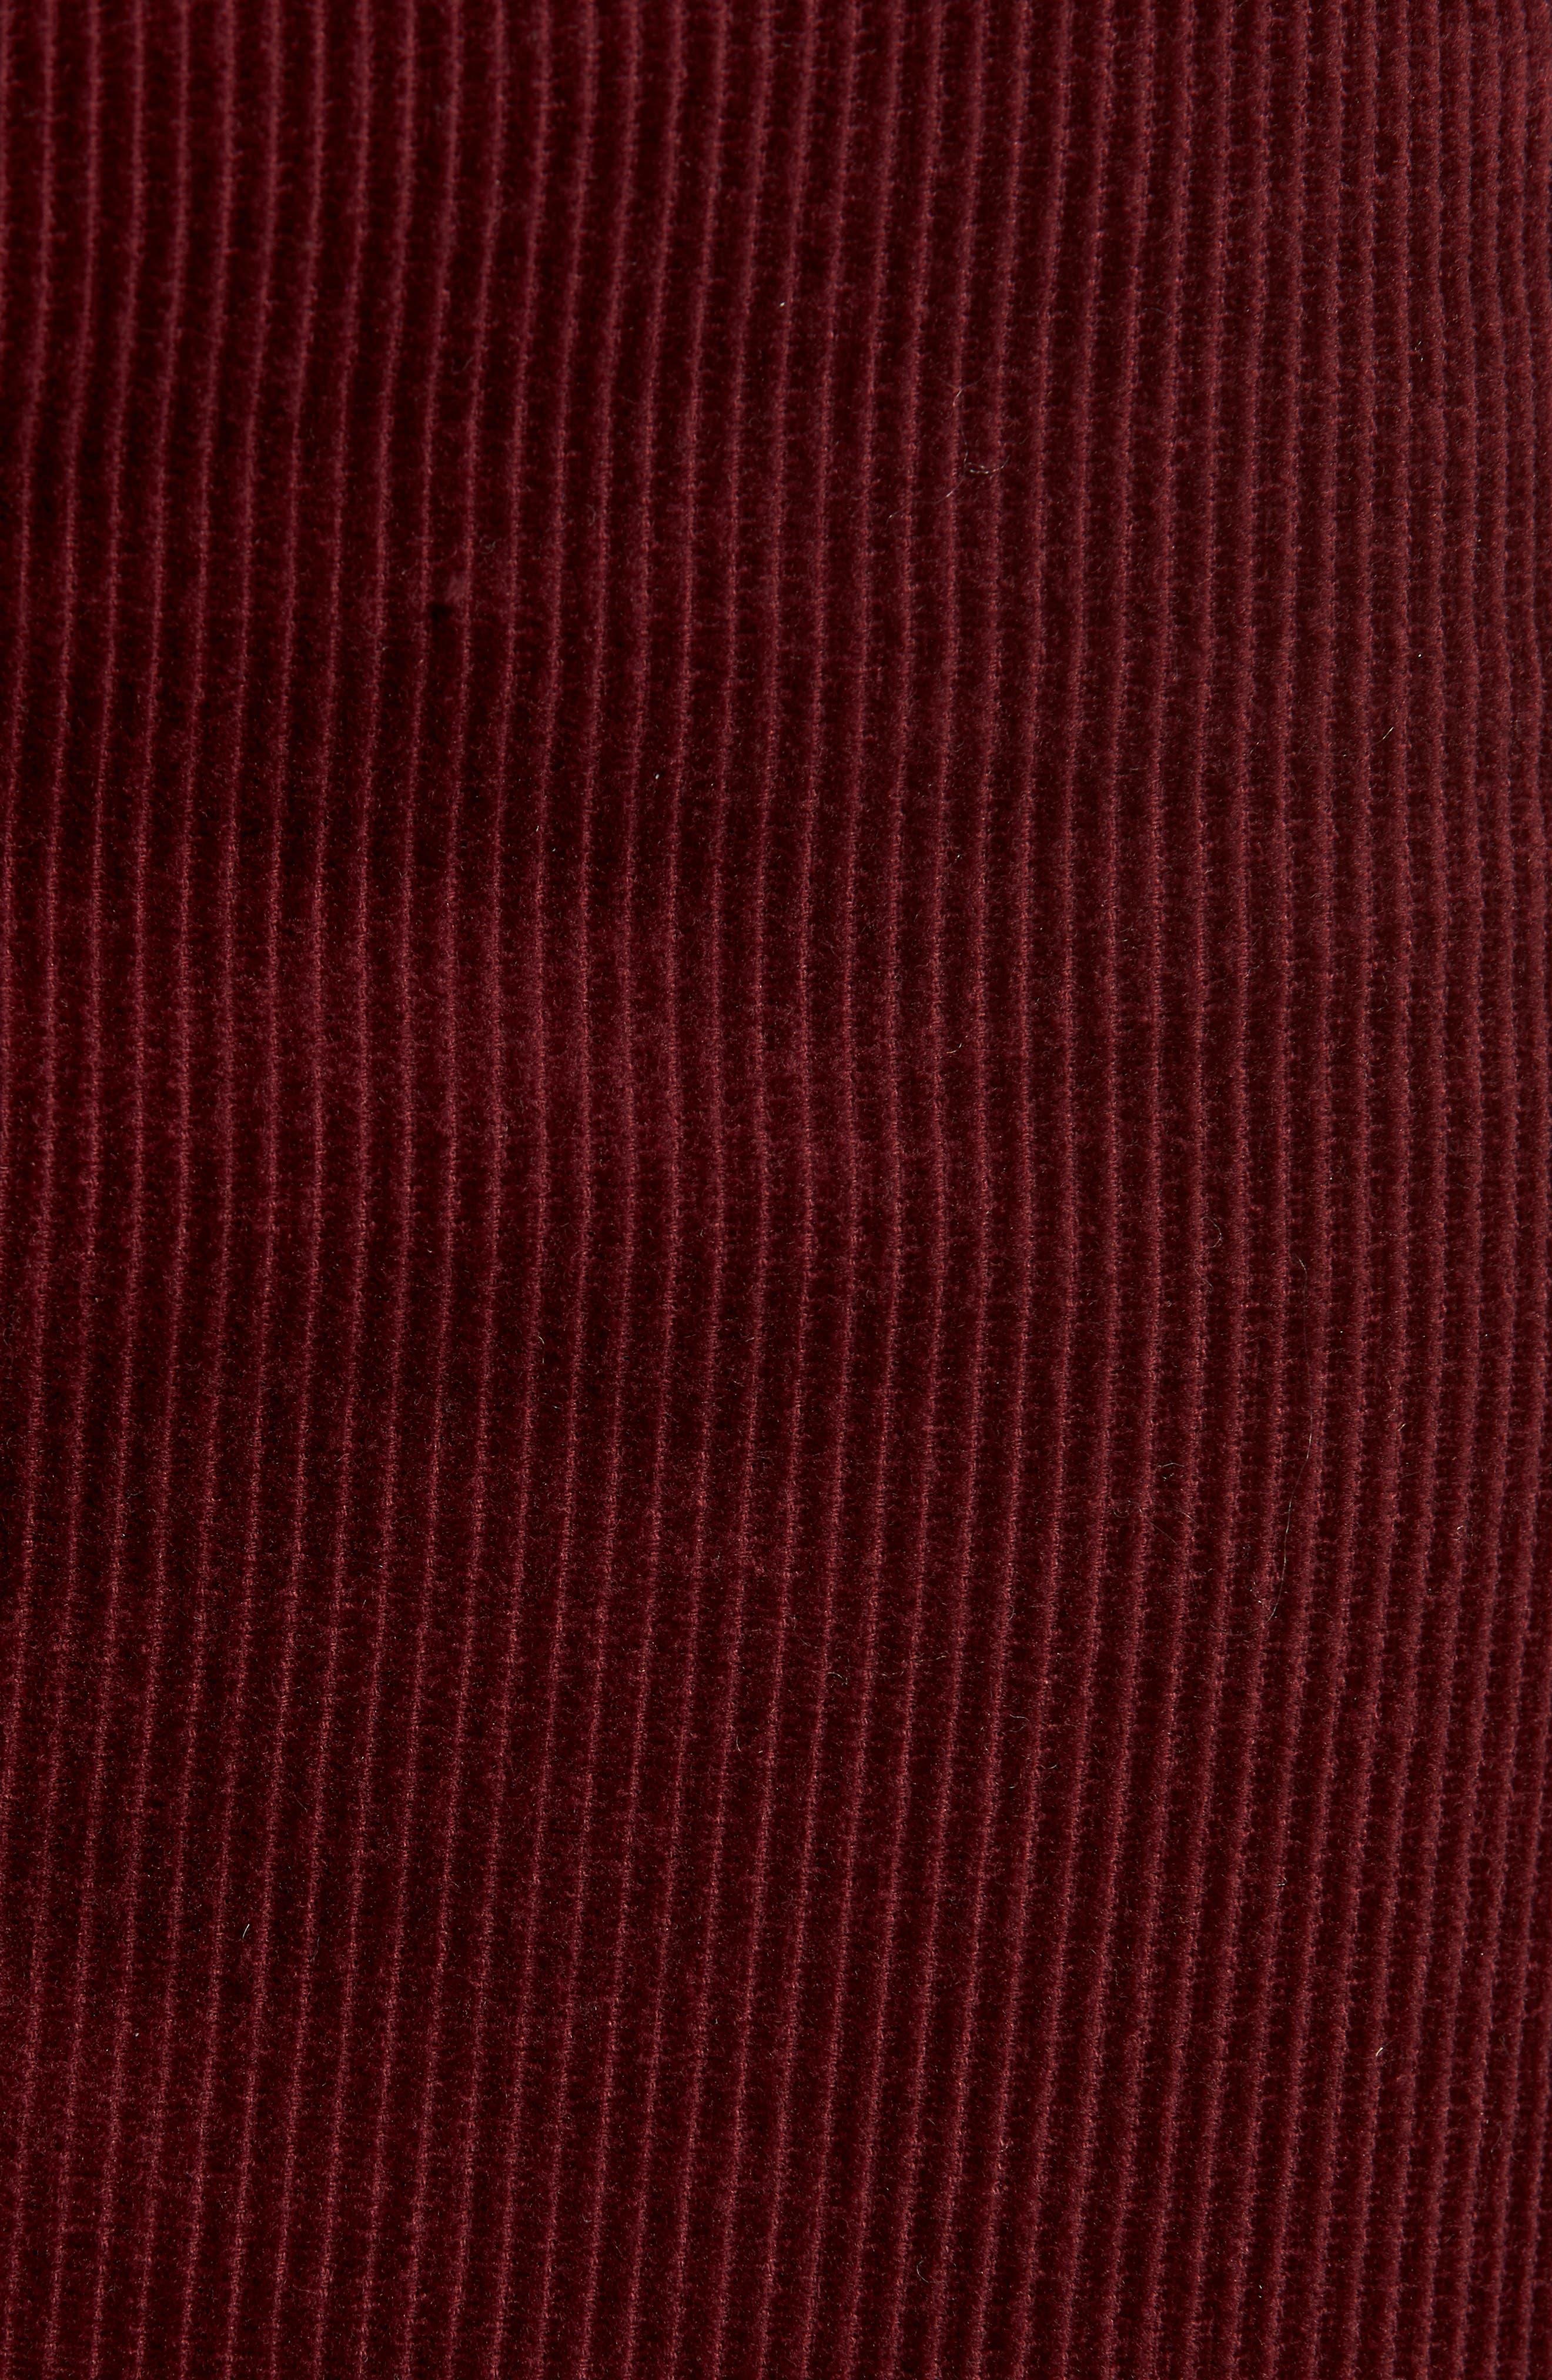 Corduroy A-Line Miniskirt,                             Alternate thumbnail 5, color,                             MERLOT